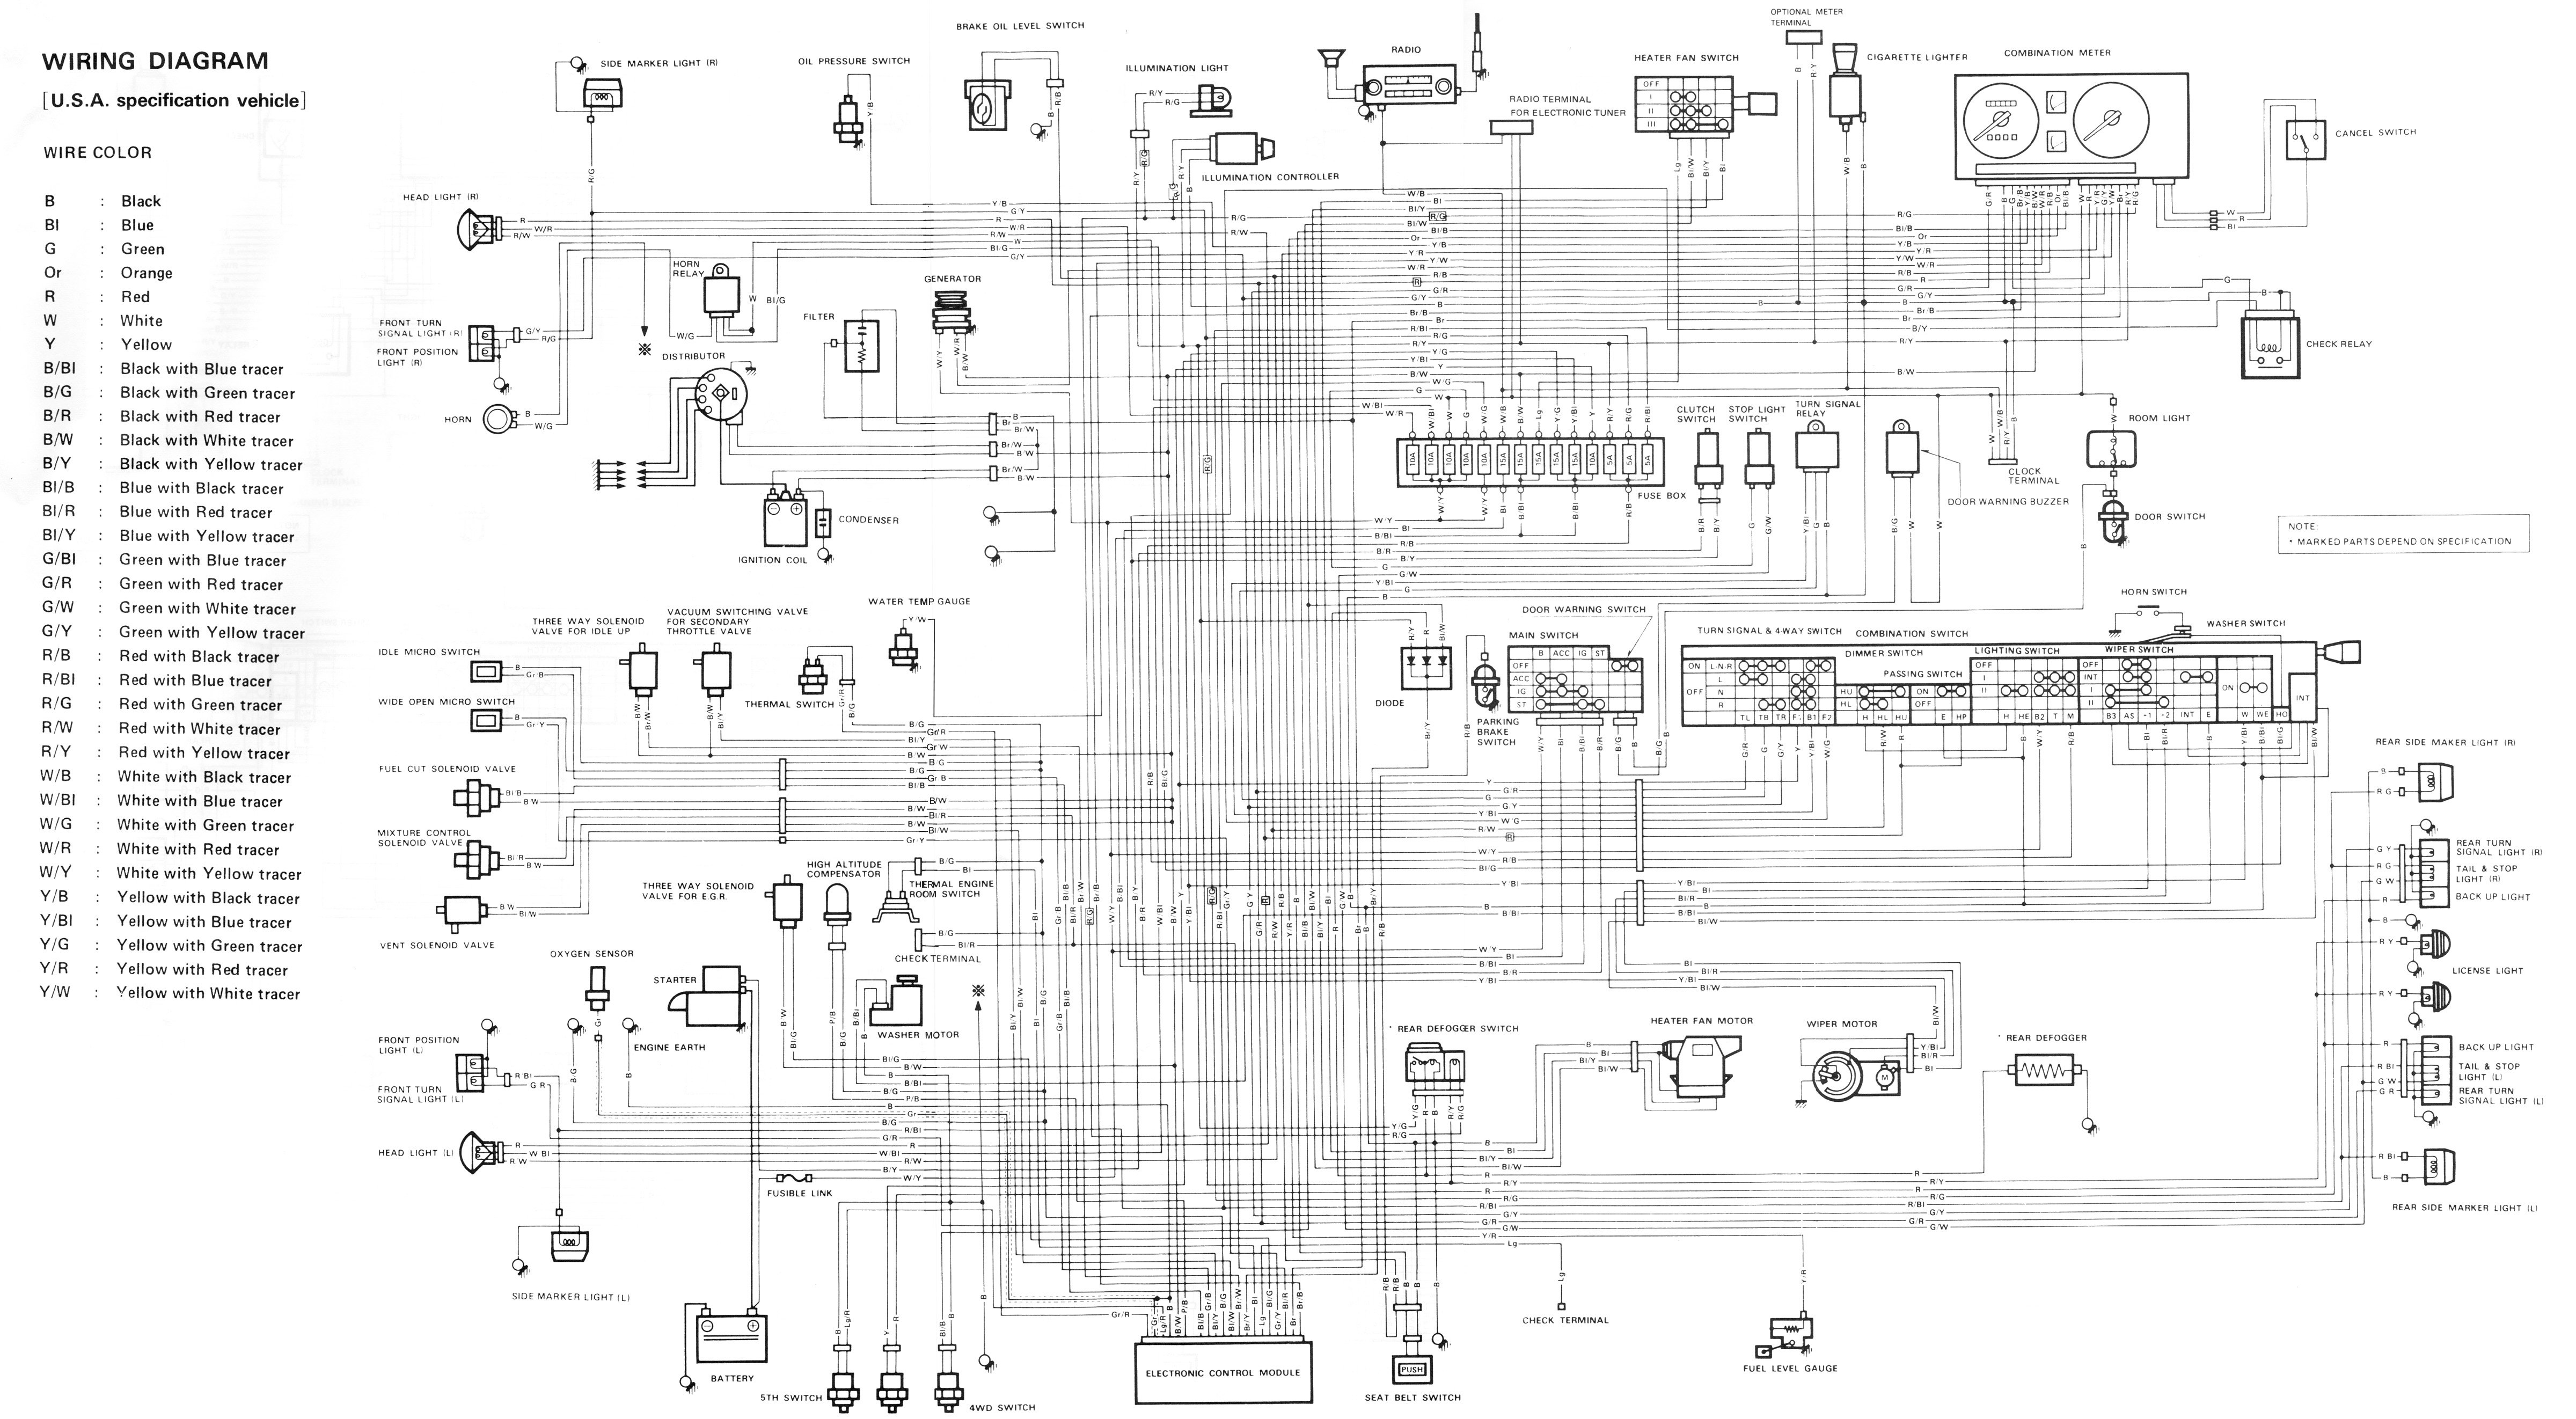 Suzuki Samurai WiringDiagram